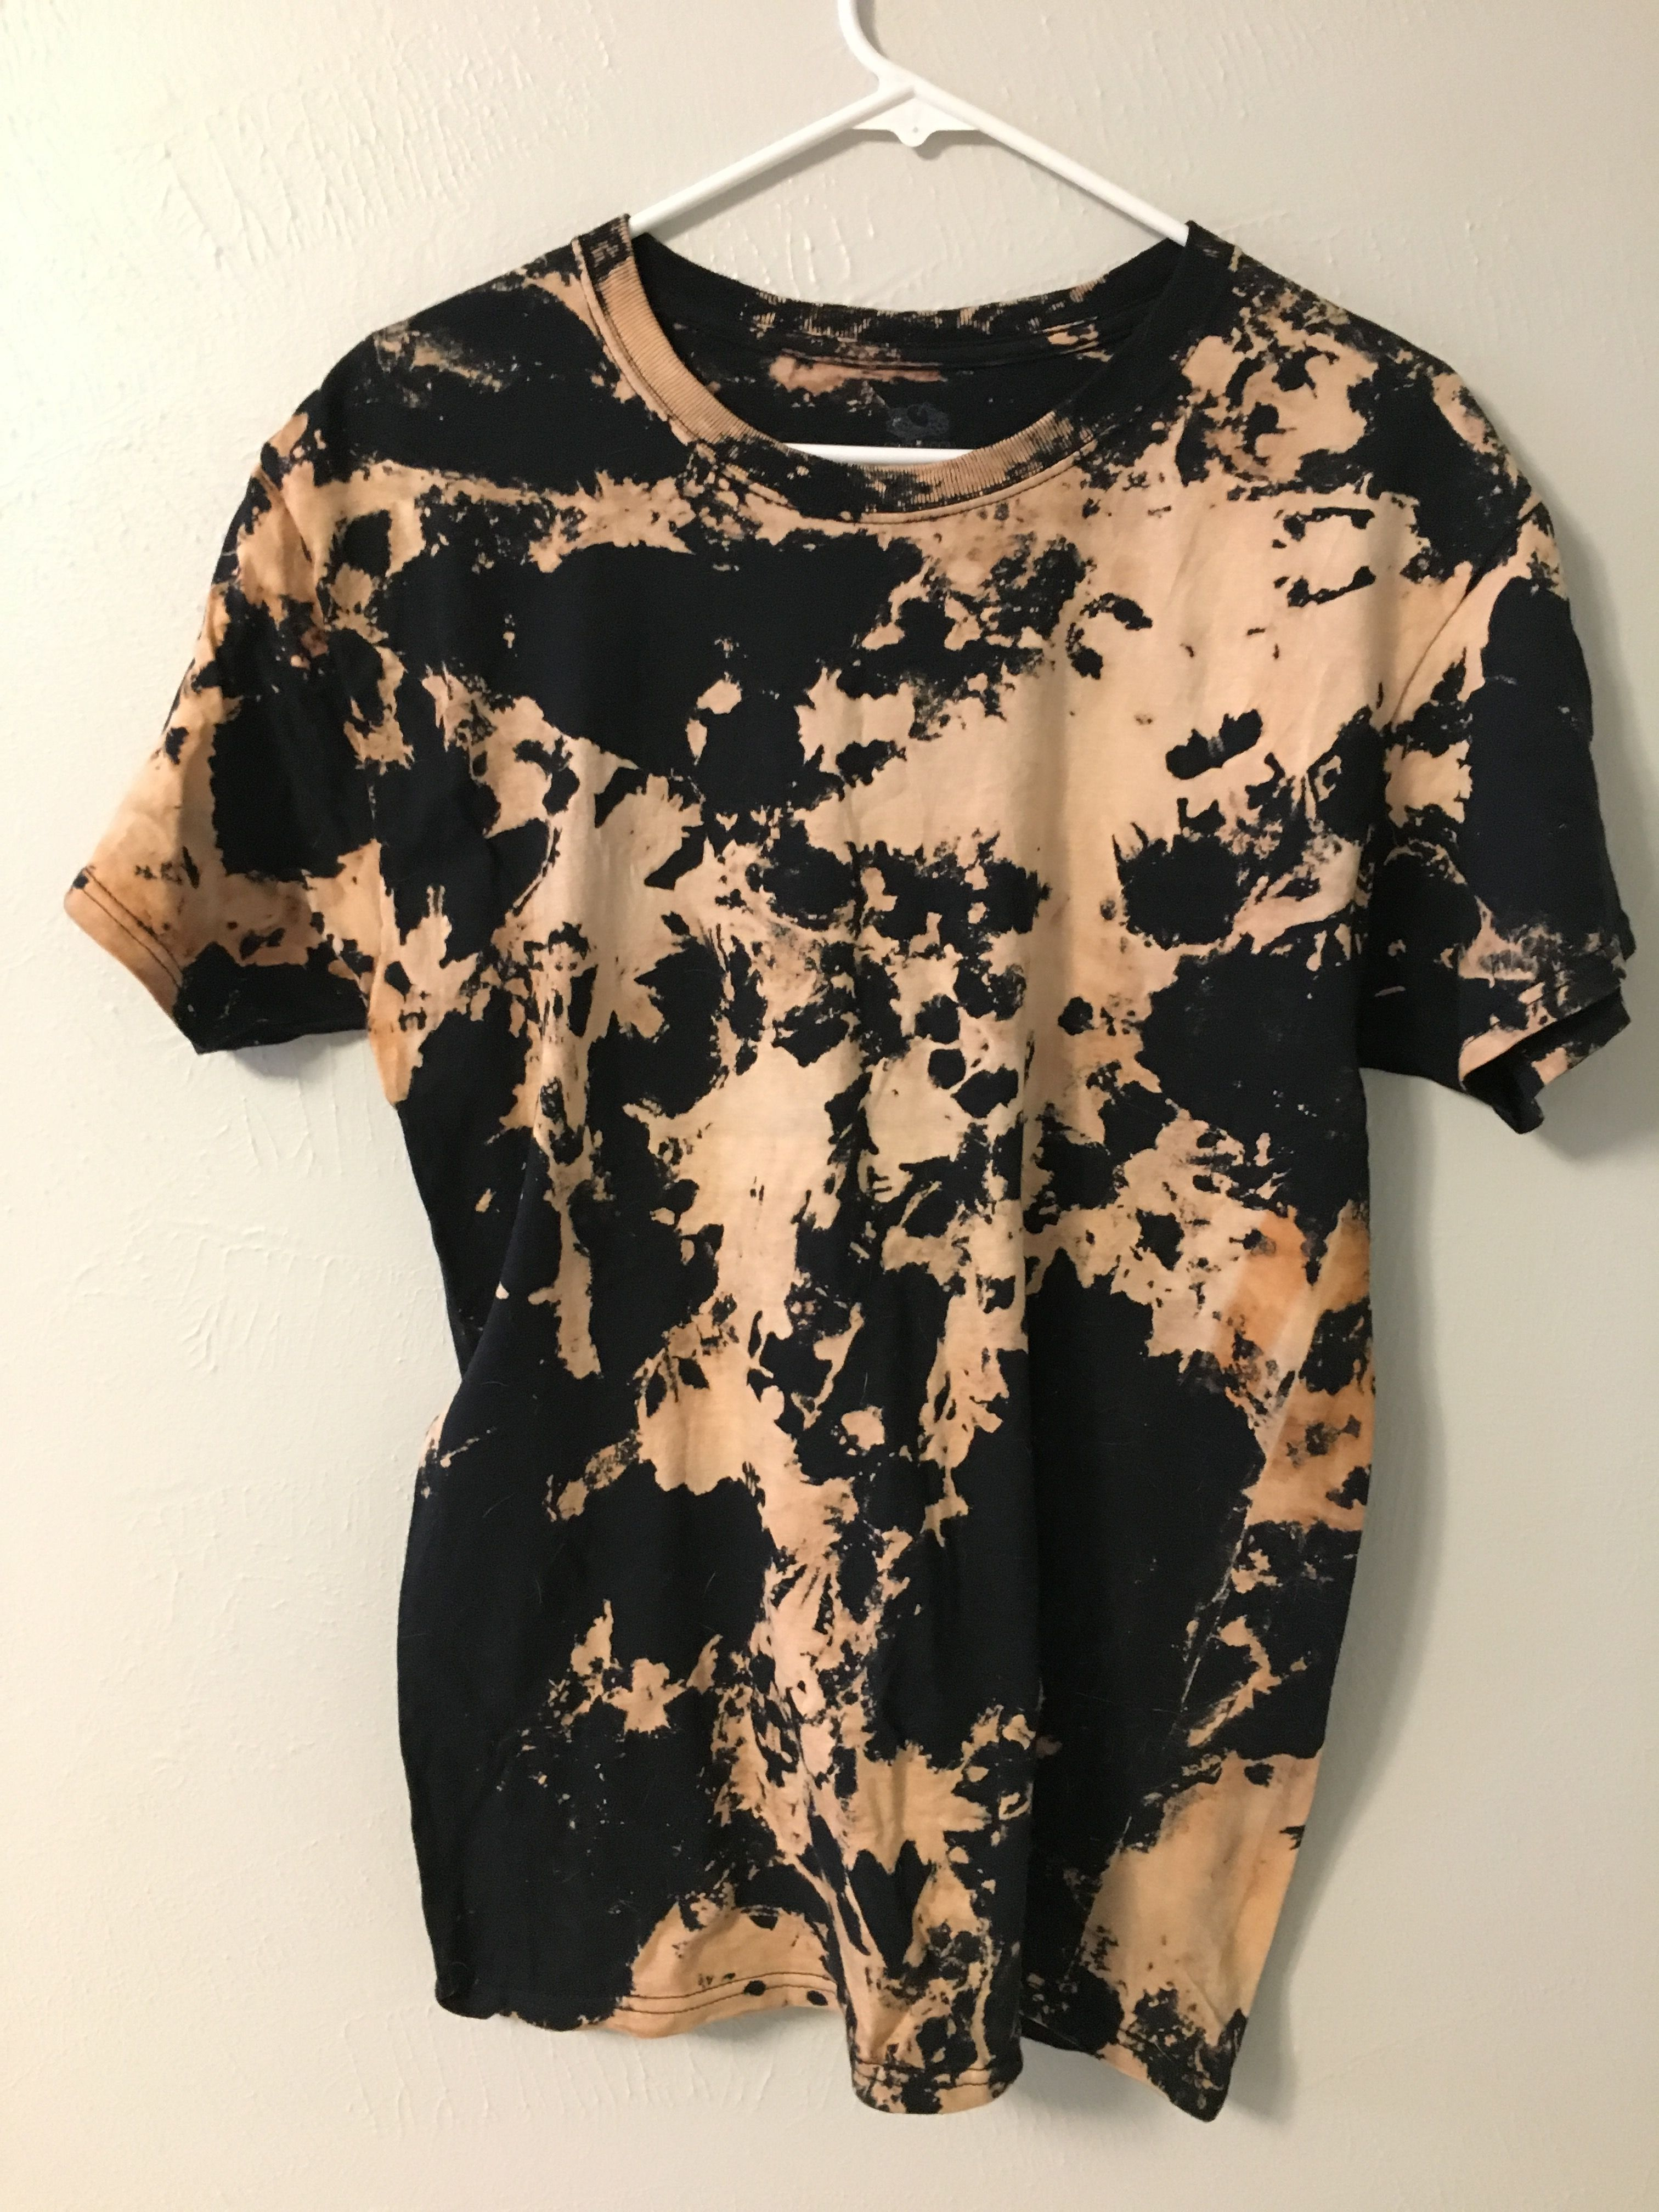 Bleach Shirt Crumble Method Diy Tie Dye Shirts Bleach Dye Shirts Reverse Tie Dye